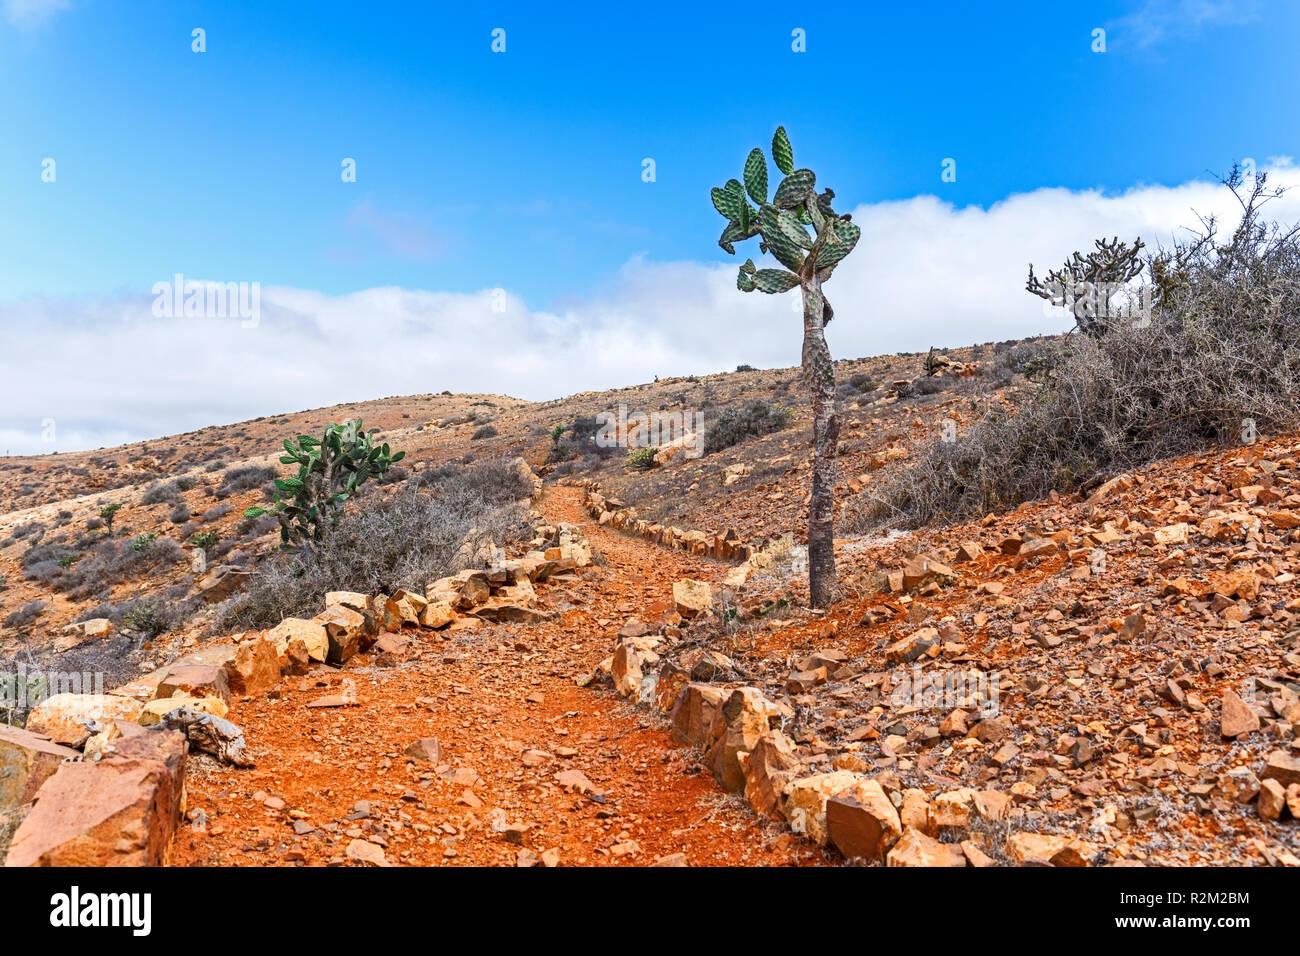 Kaktus in Wilden vulkanischen Landschaft, Fuerteventura, Kanarische Inseln Stockfoto